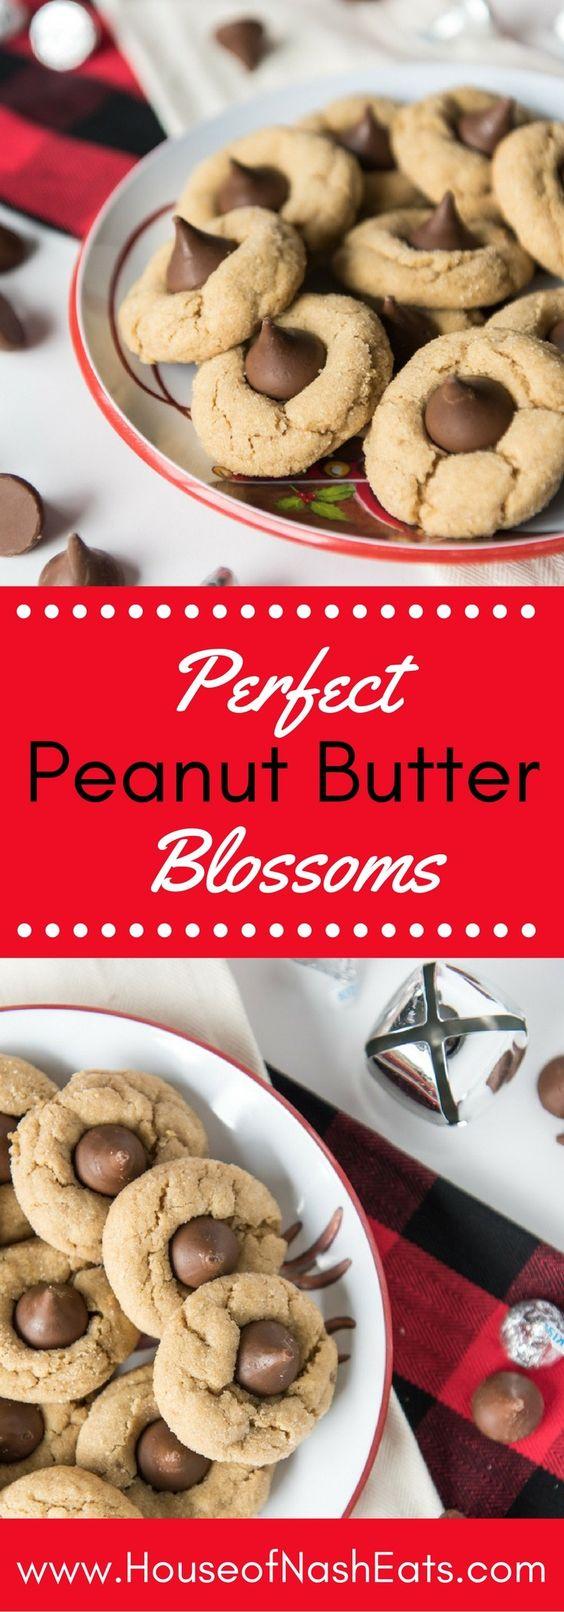 34 Peanut Butter Blossoms